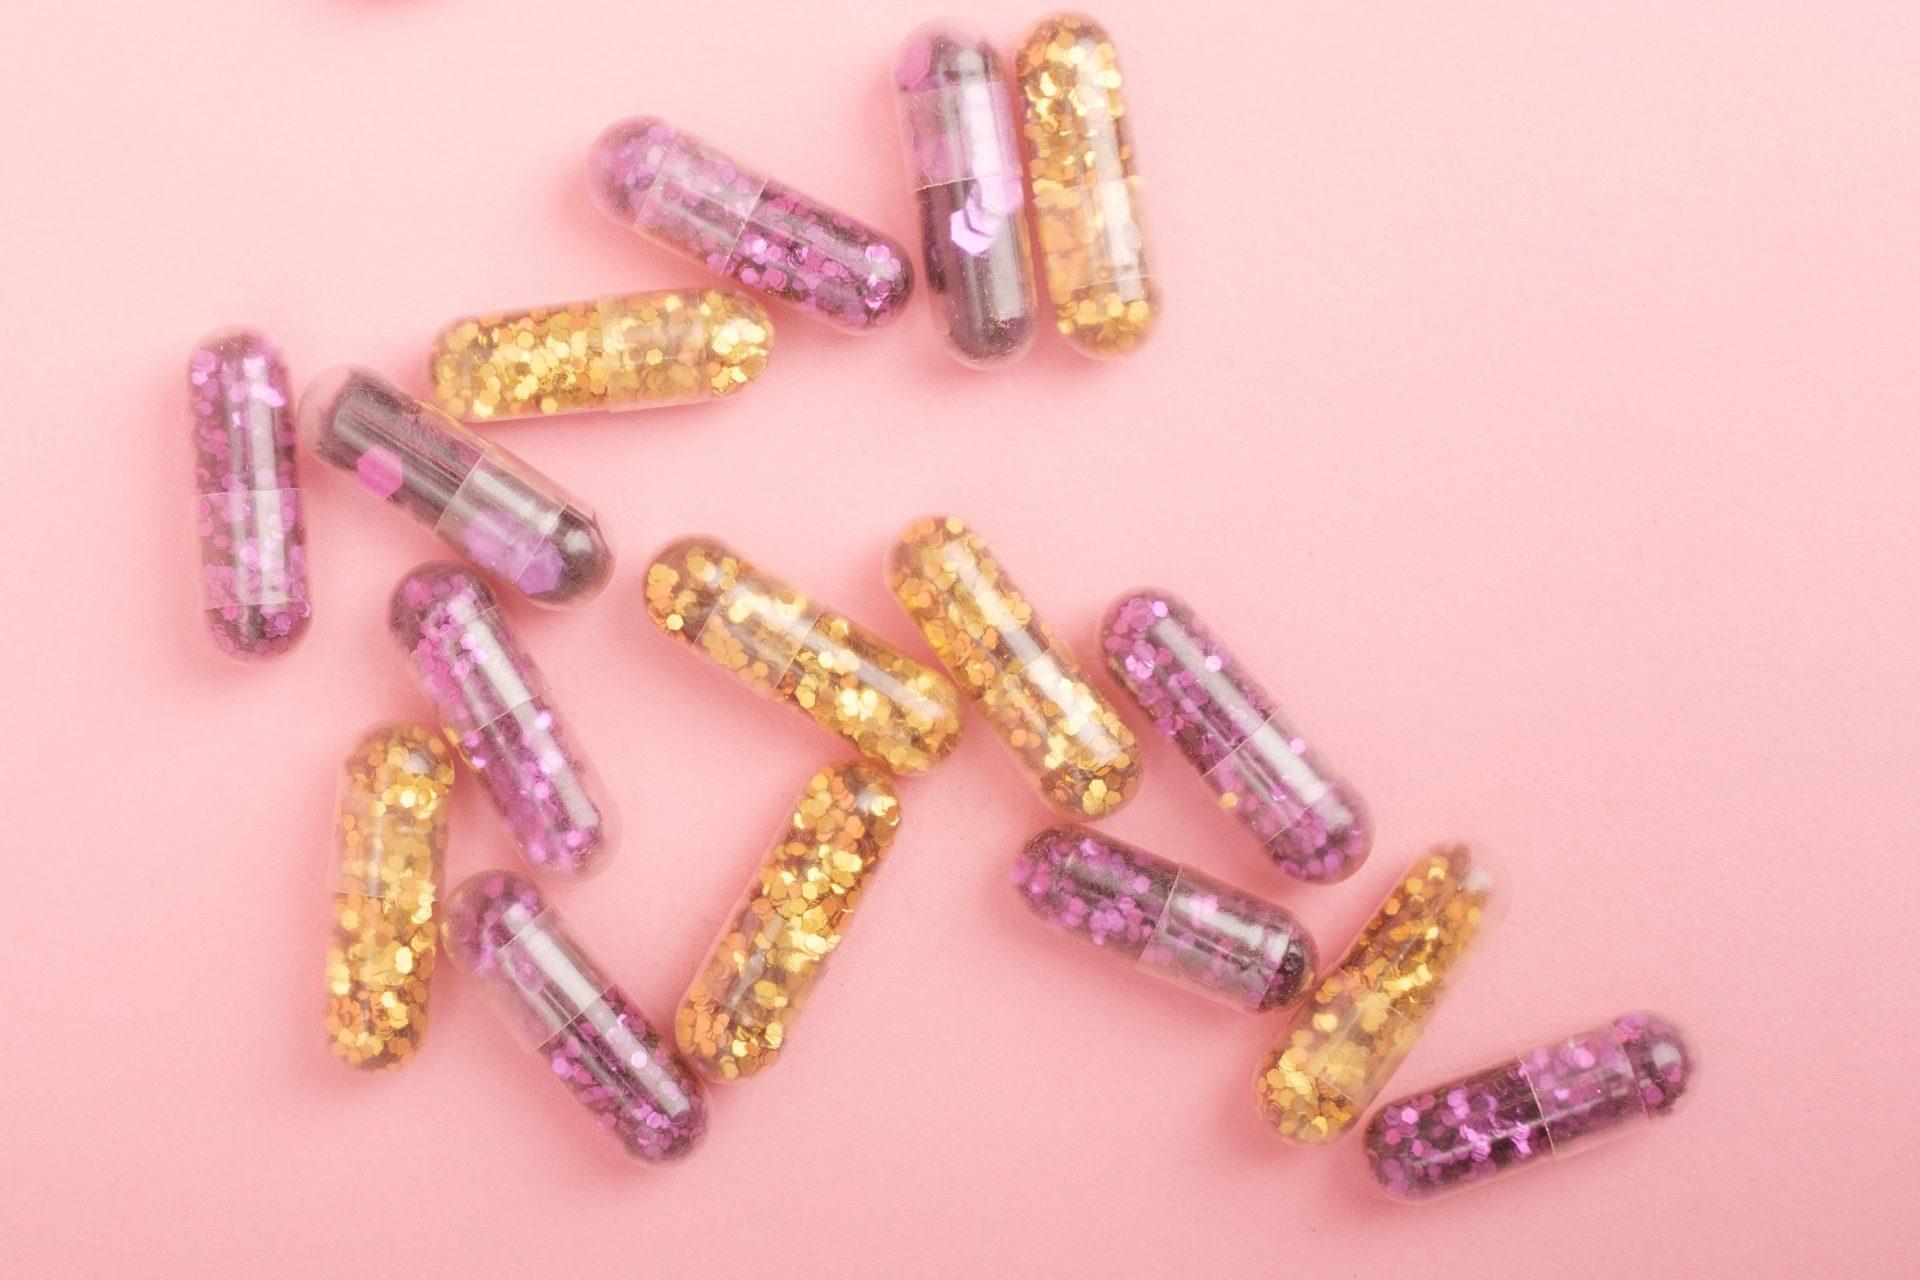 Alérgicos: o problema pode estar no corante dos medicamentos